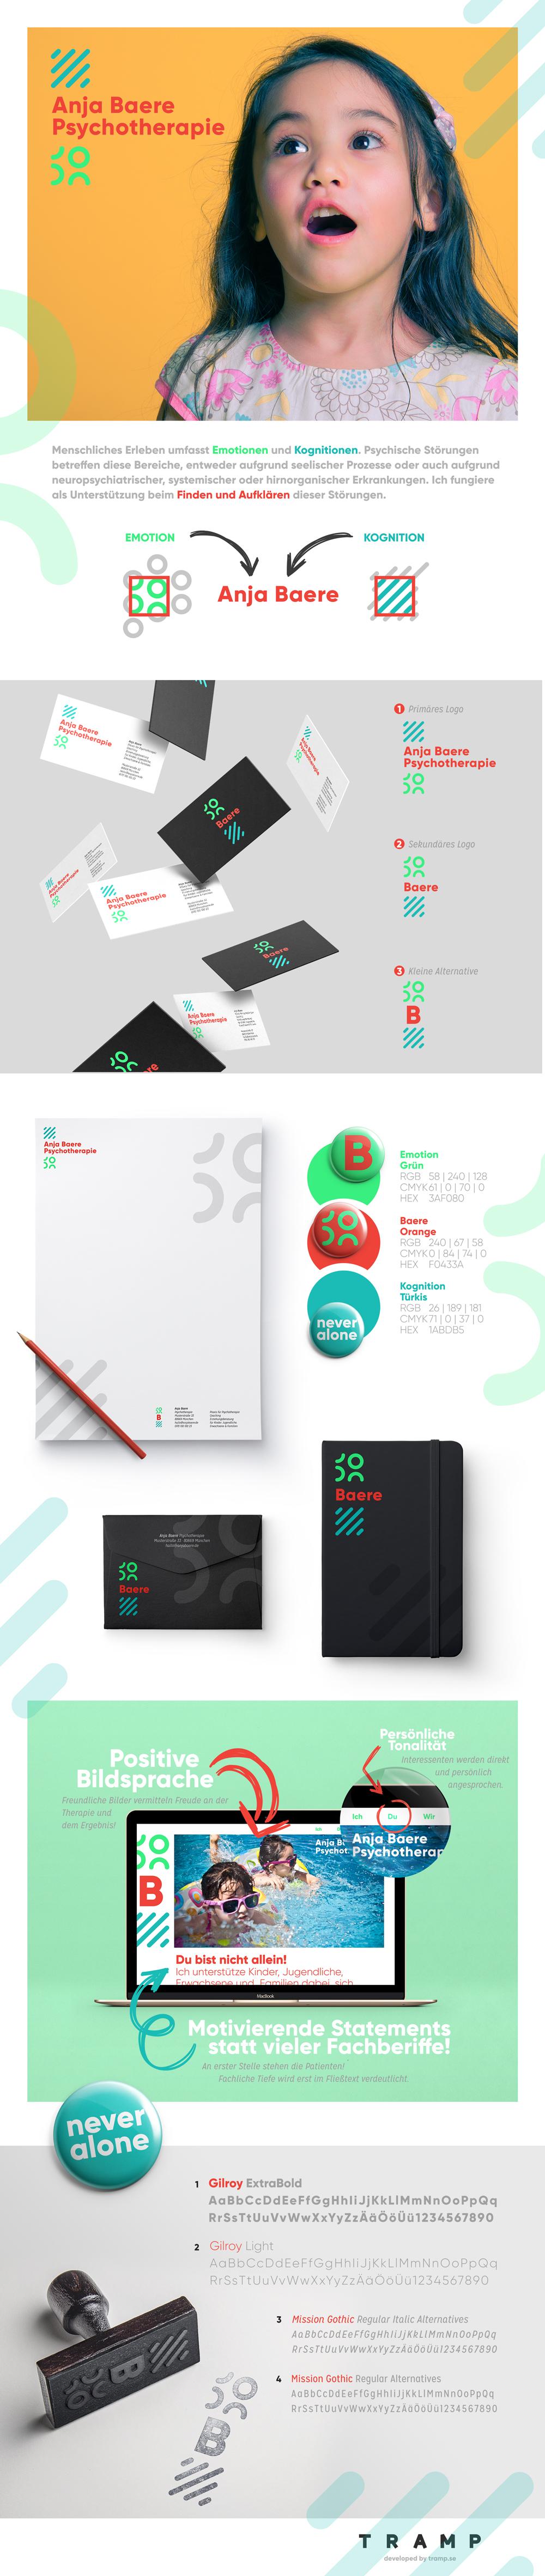 Anja Baere Identity CI designed by Tobias Heumann